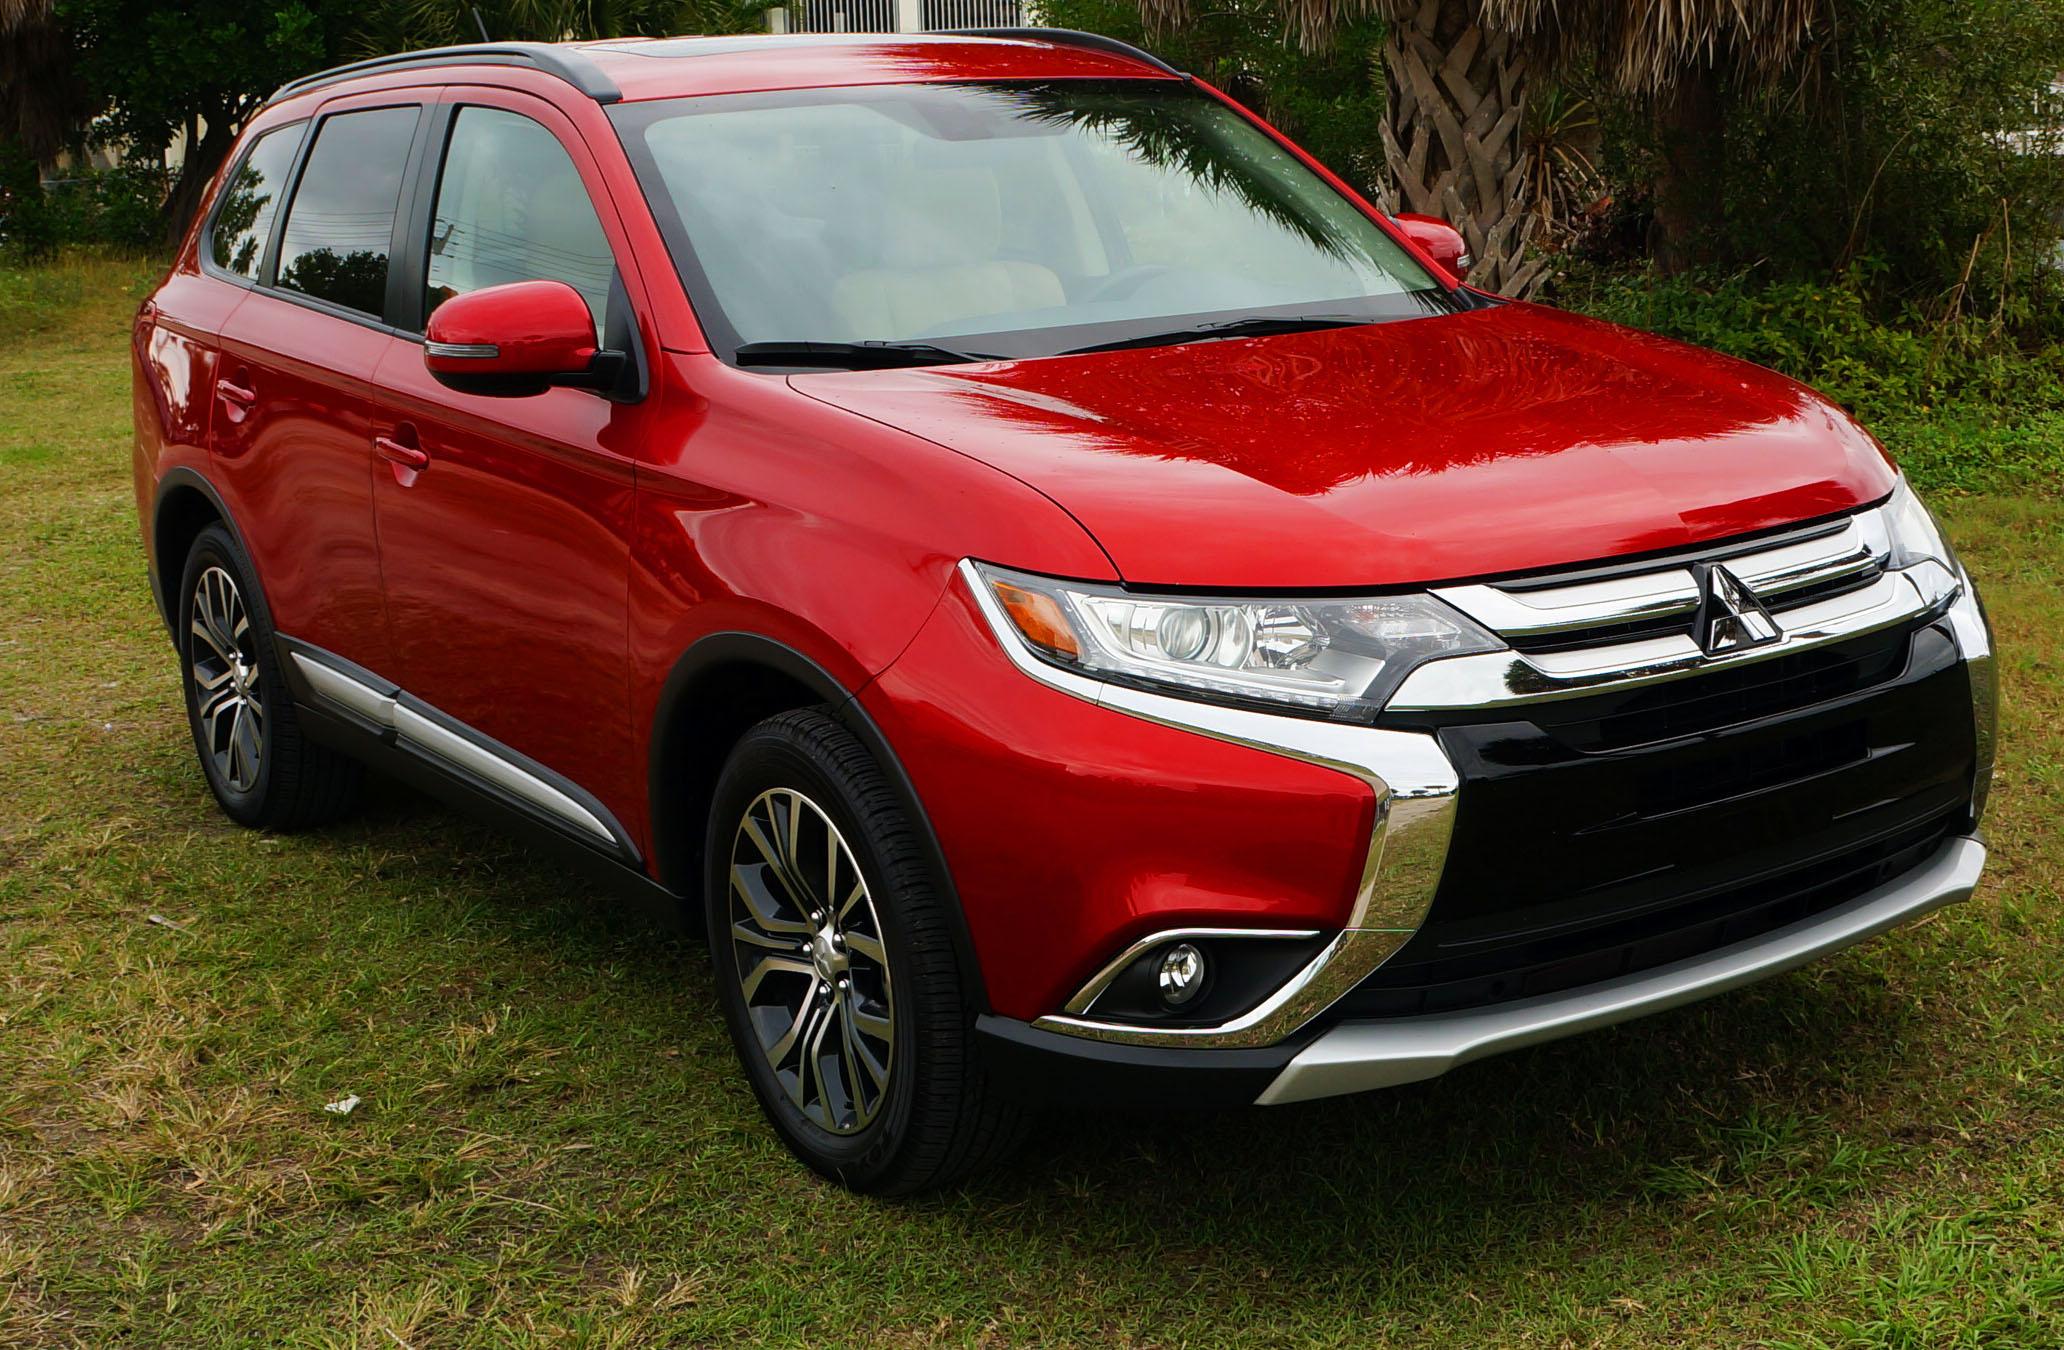 review mitsubishi outlander suv rally red